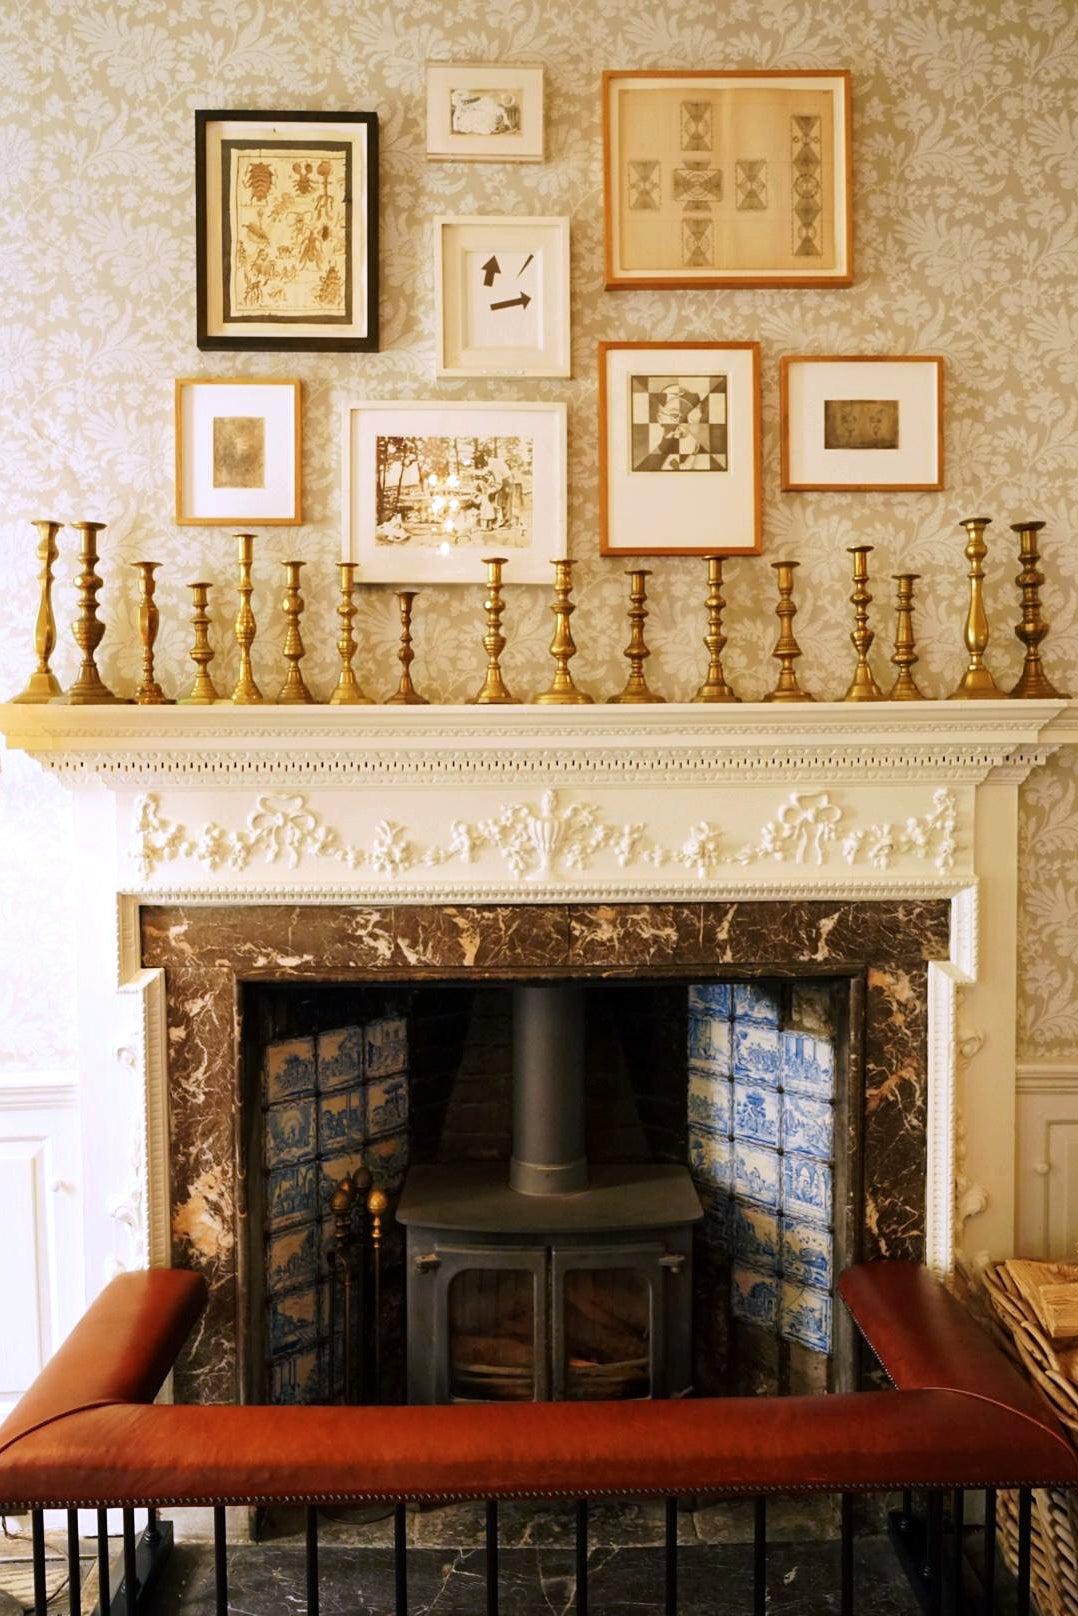 Babbington House Fireplace